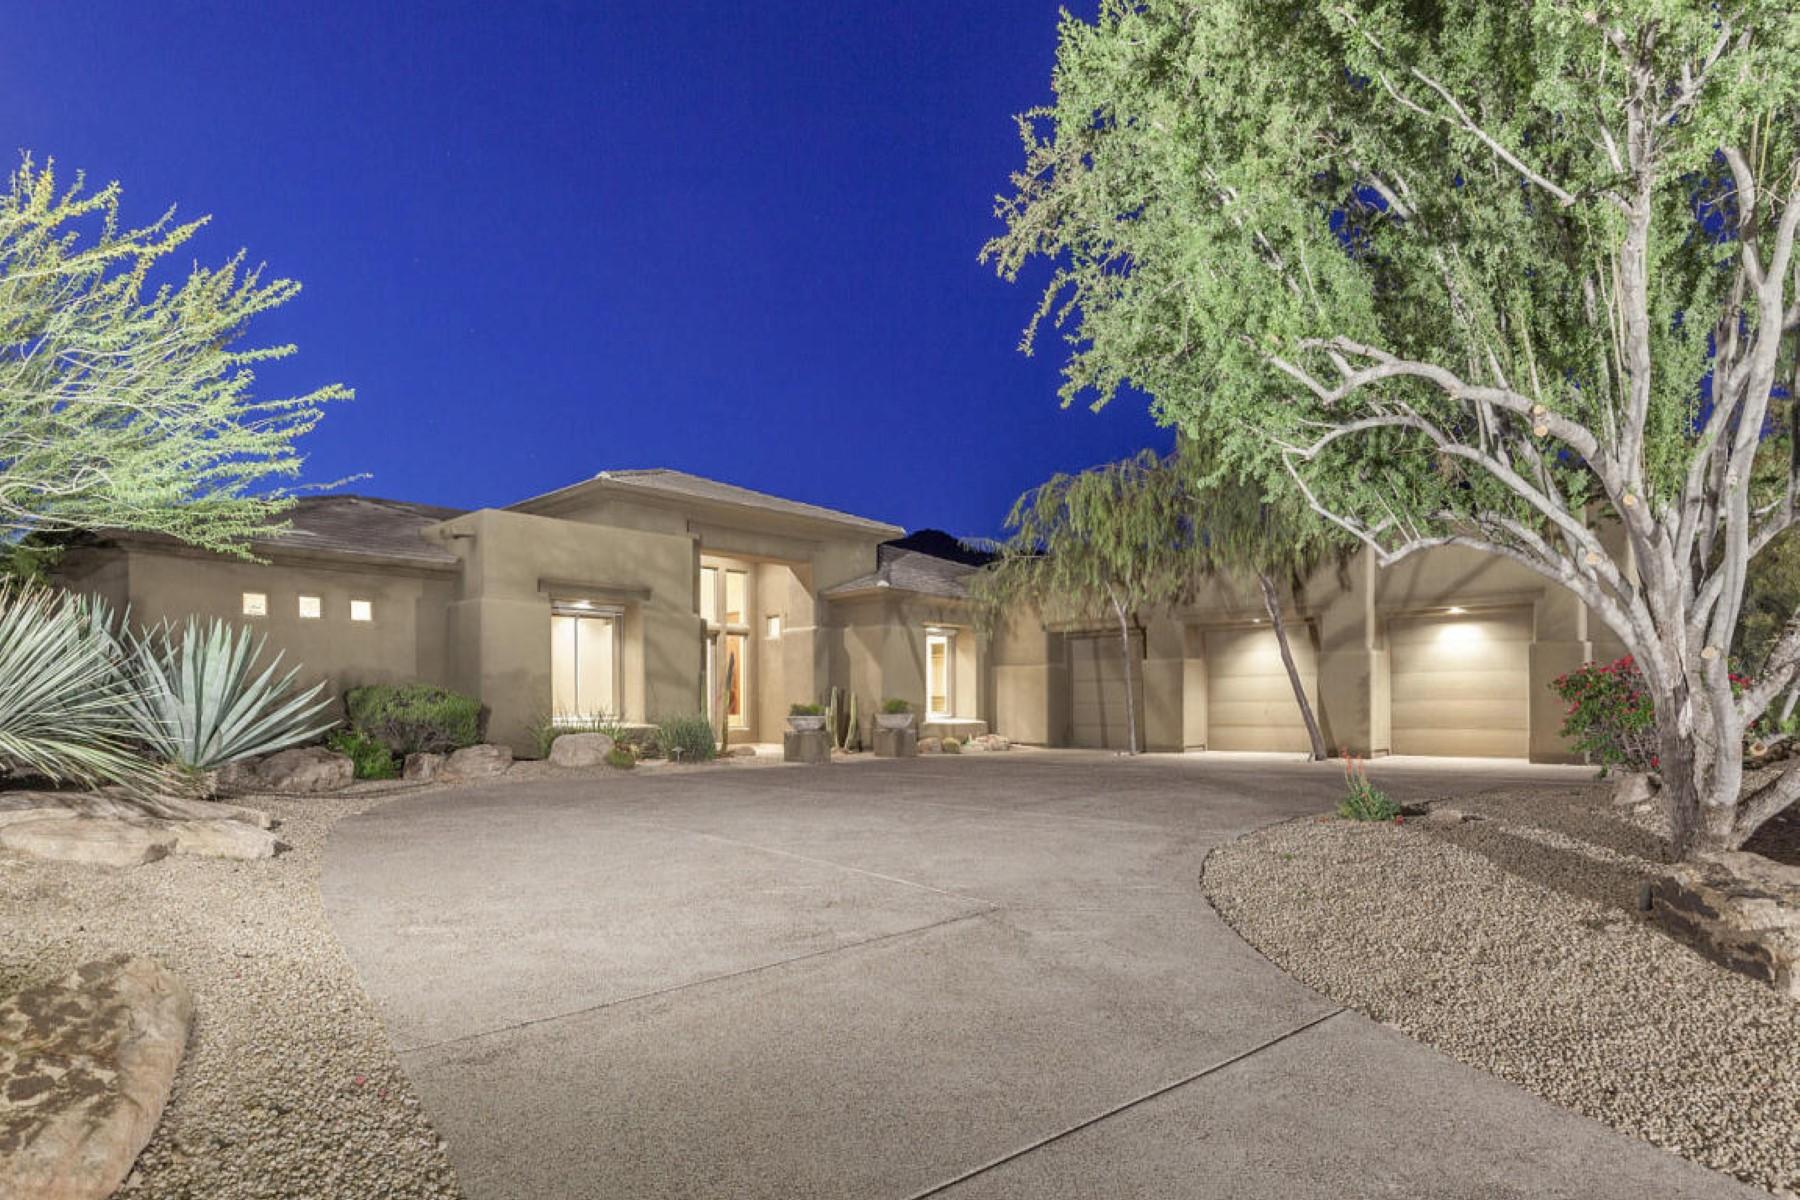 Частный односемейный дом для того Продажа на Gorgeous custom home with great city and mountain views 11888 N 134th Way Scottsdale, Аризона, 85259 Соединенные Штаты